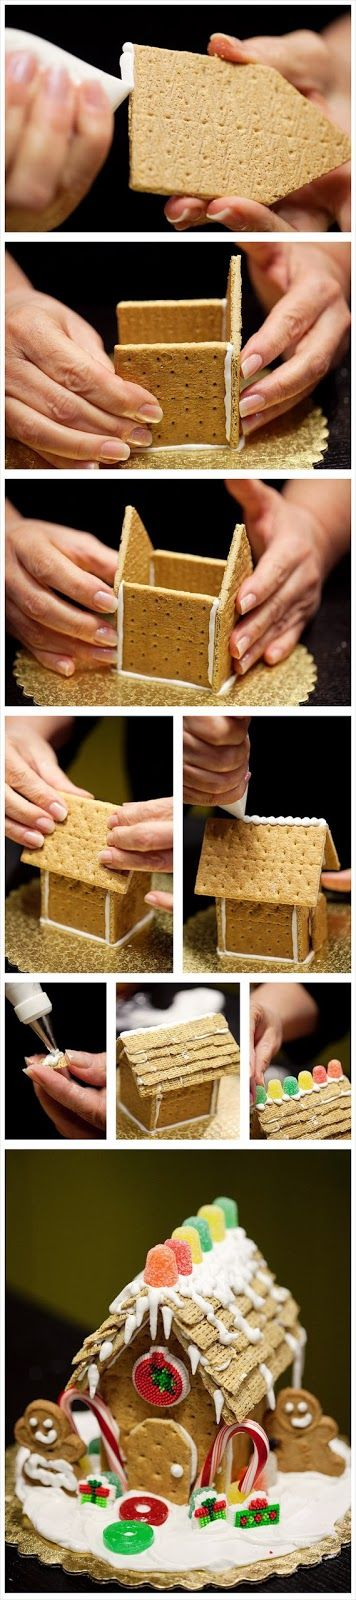 DIY Cute Gingerbread House